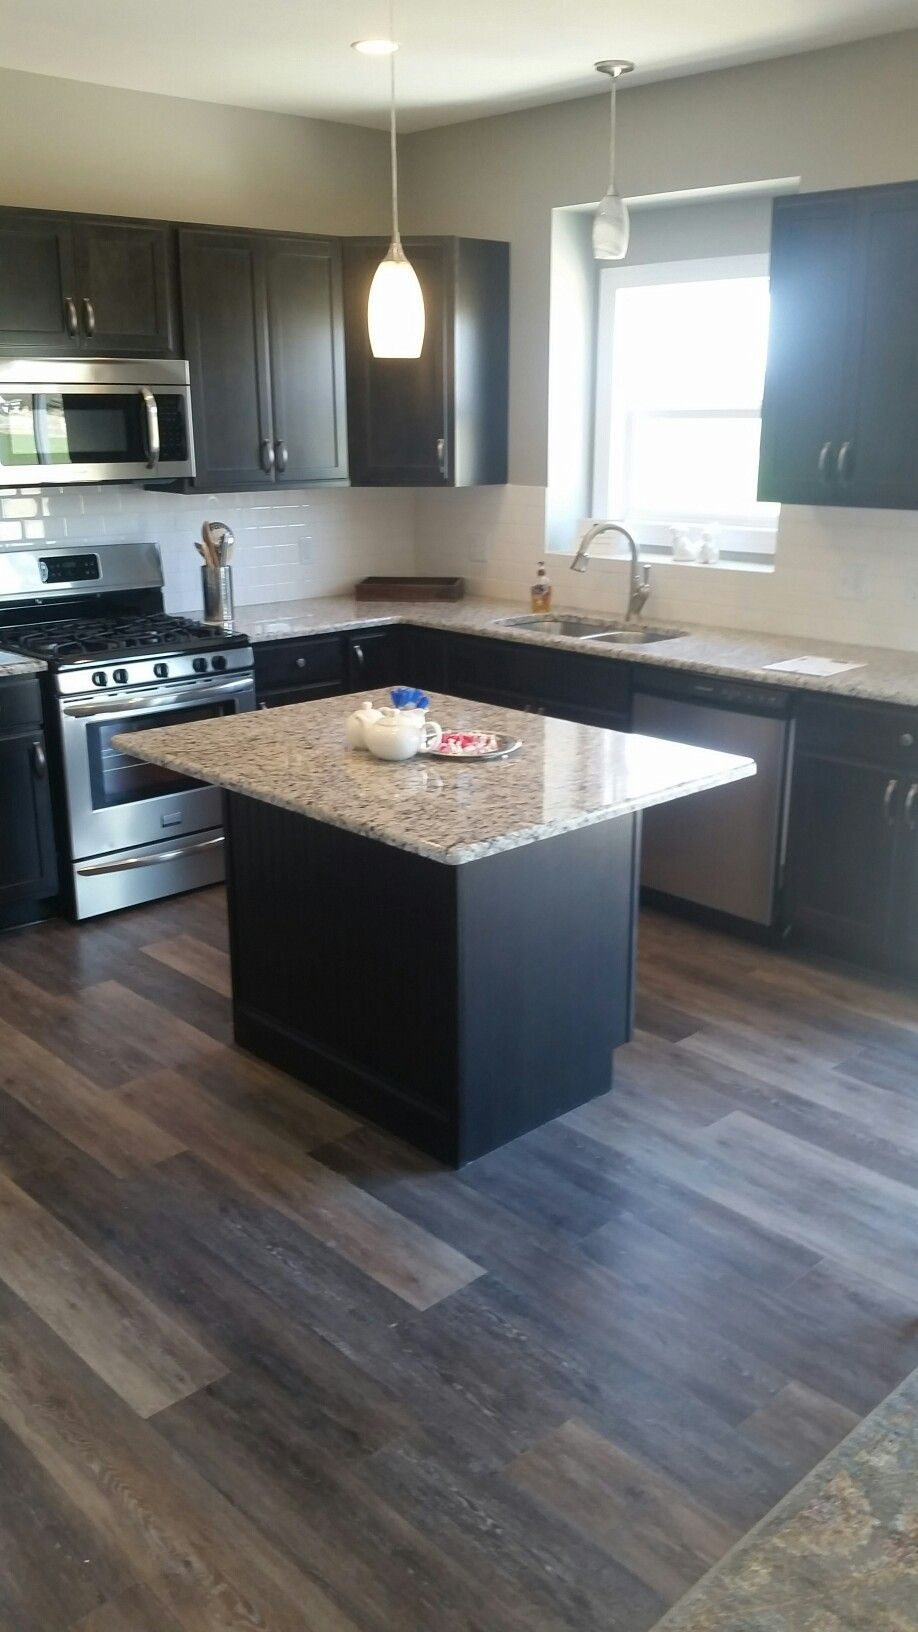 Granite Countertops And Island With Overhang Coretec Alabaster Oak Flooring Stainless Kitchen Cabinets Home Depot Vinyl Flooring Kitchen Oak Kitchen Cabinets